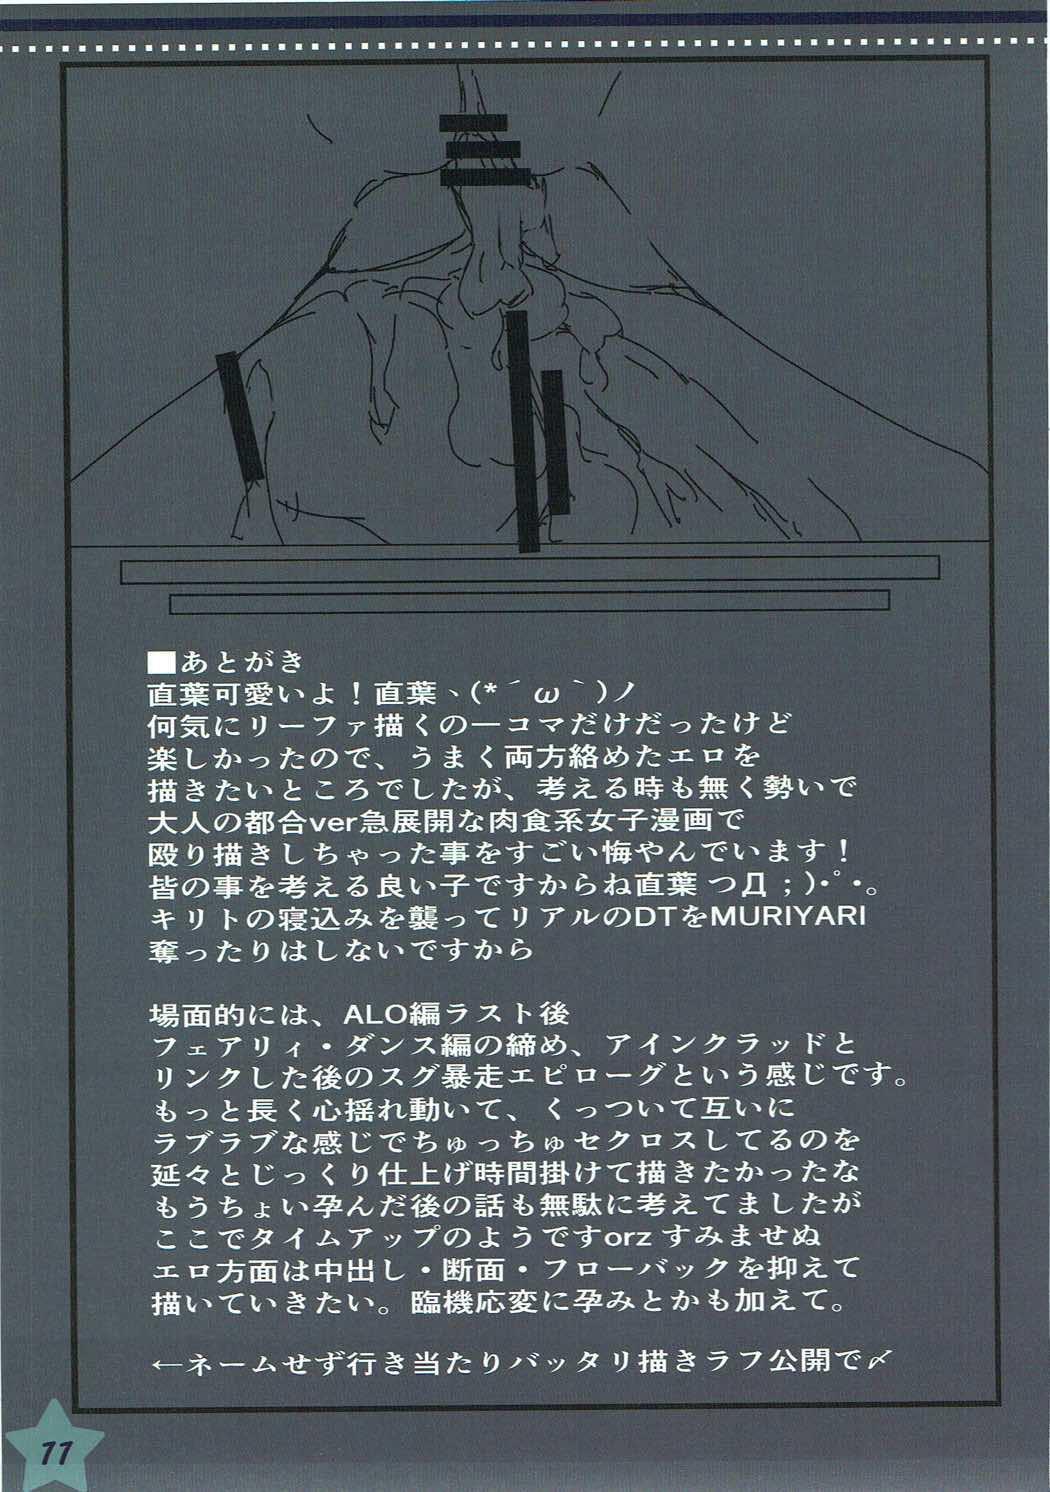 Suguha Zukushi 9